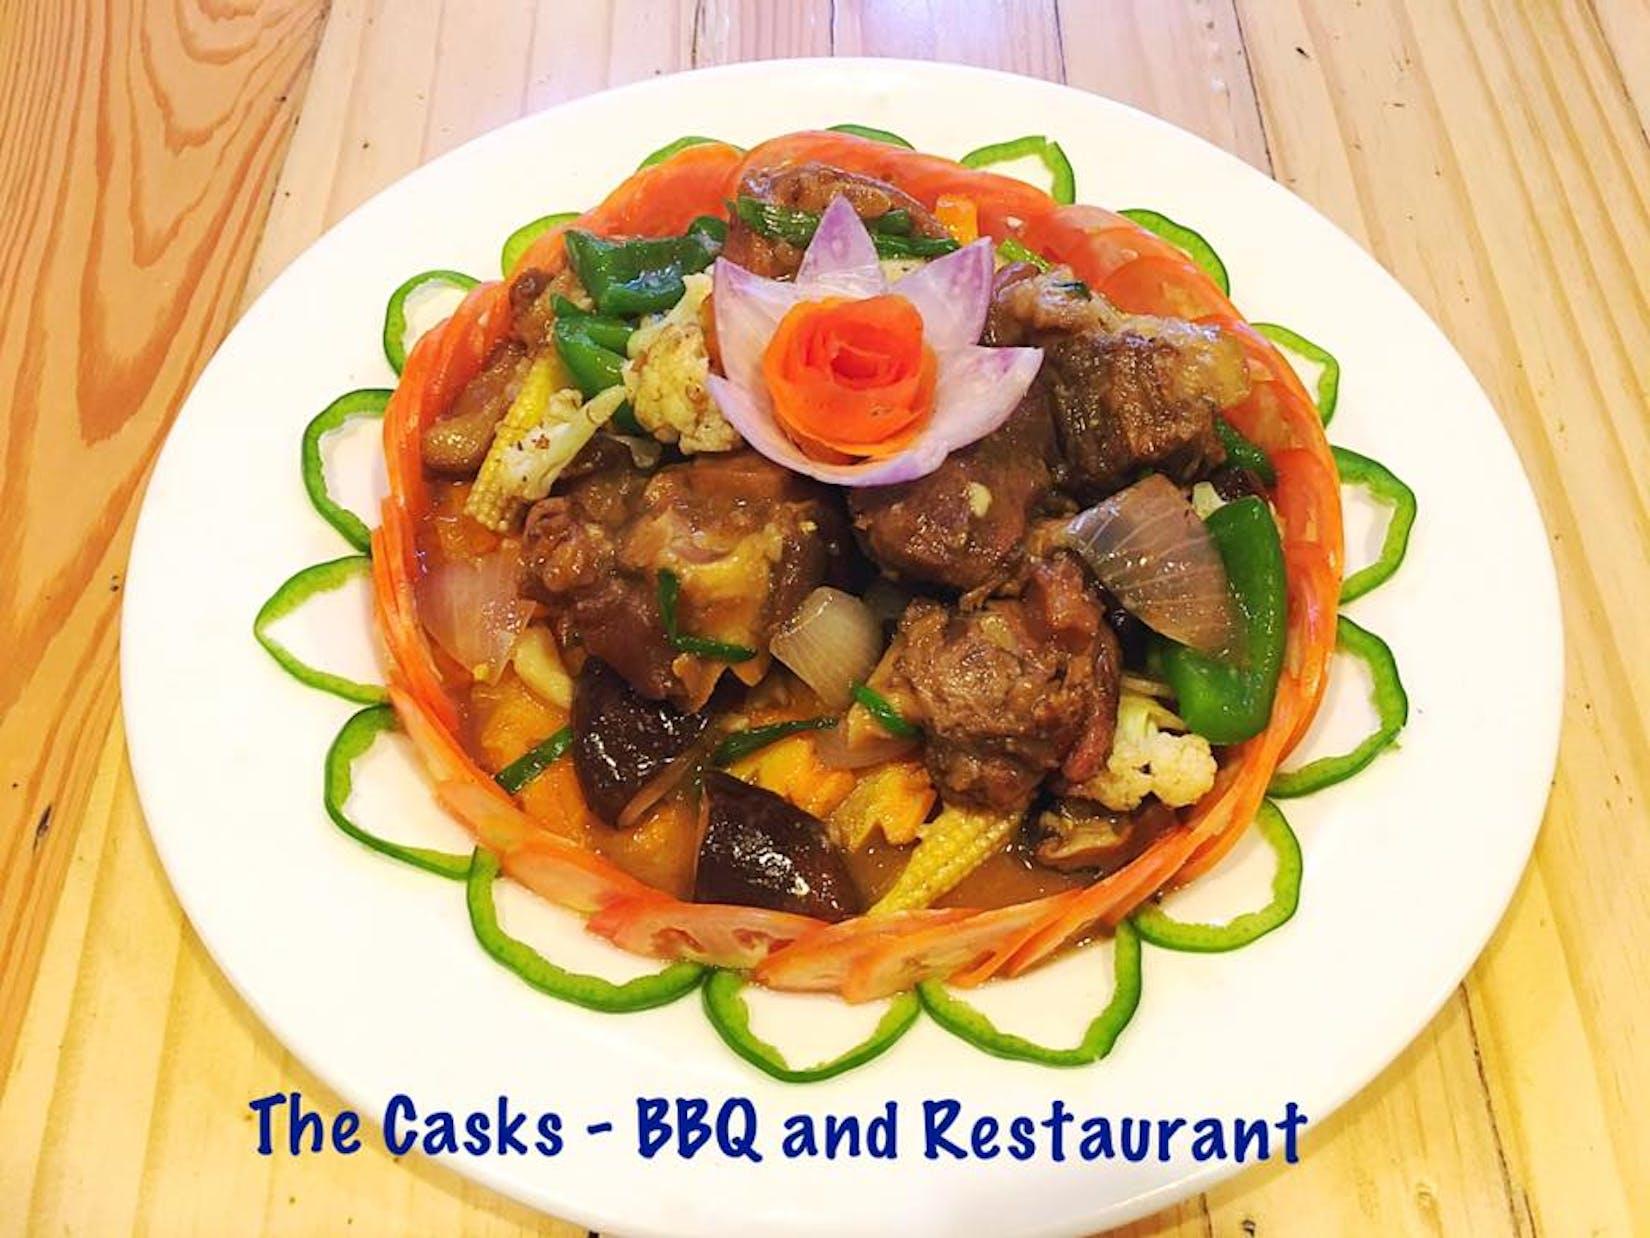 The Casks - B.B.Q, Bar and Restaurant   yathar